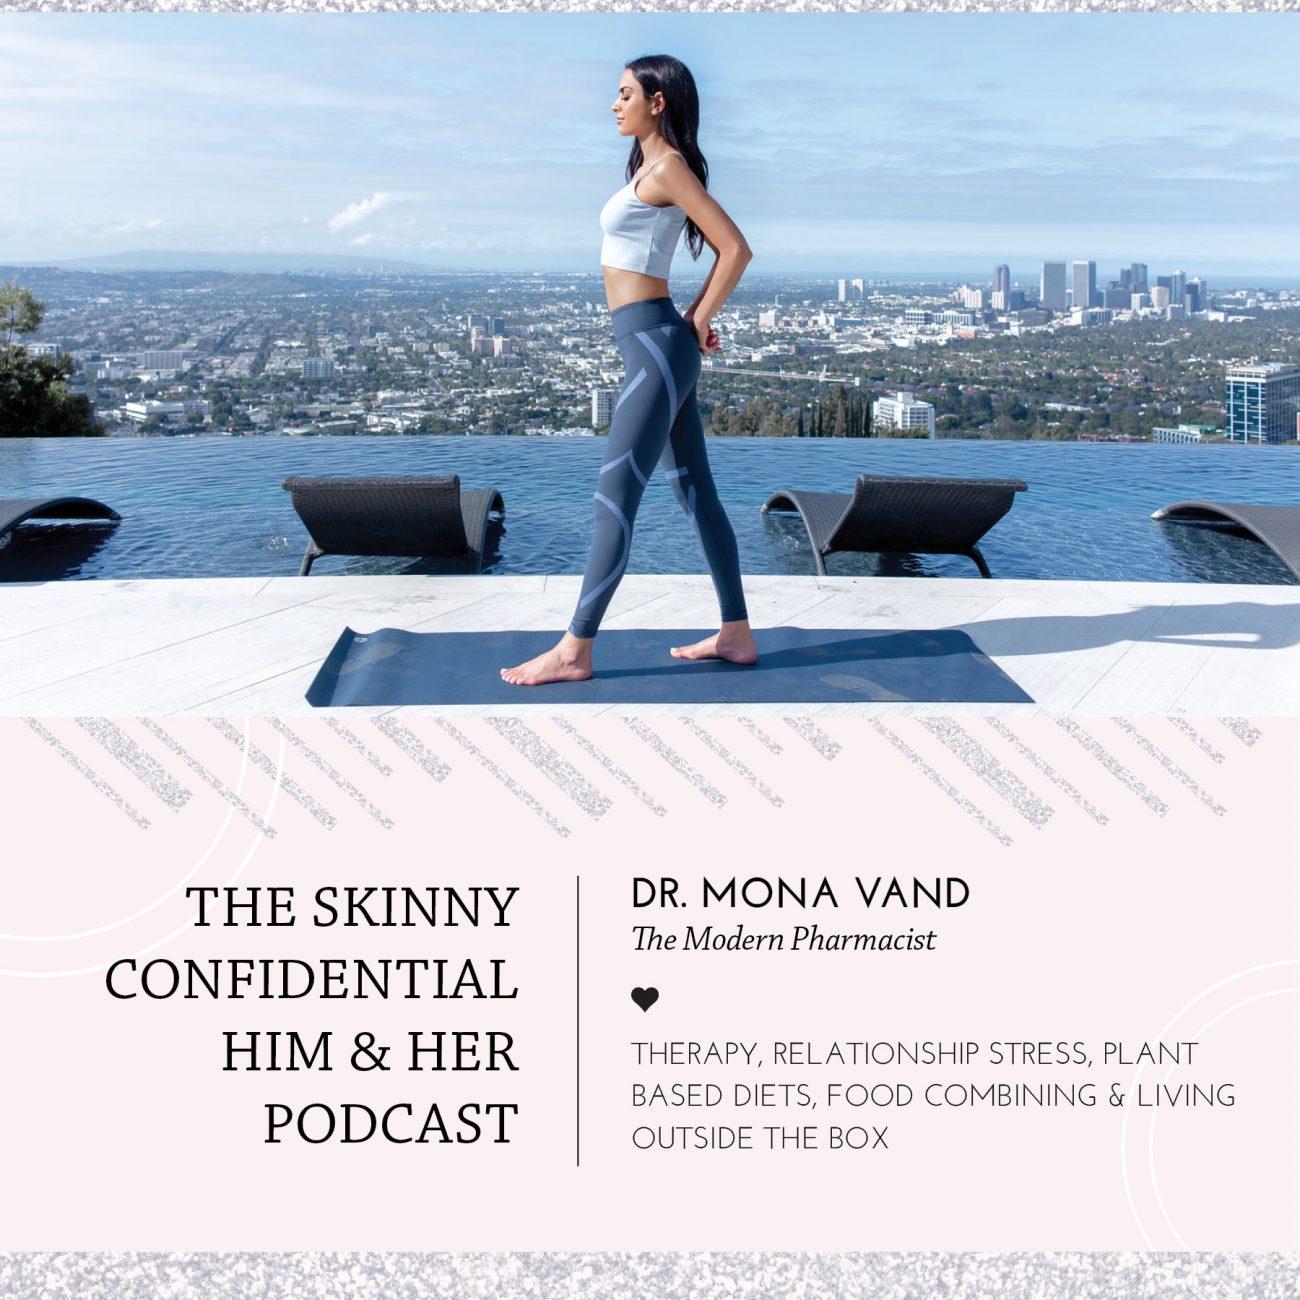 dr mona vand pharmacist skincare health wellness